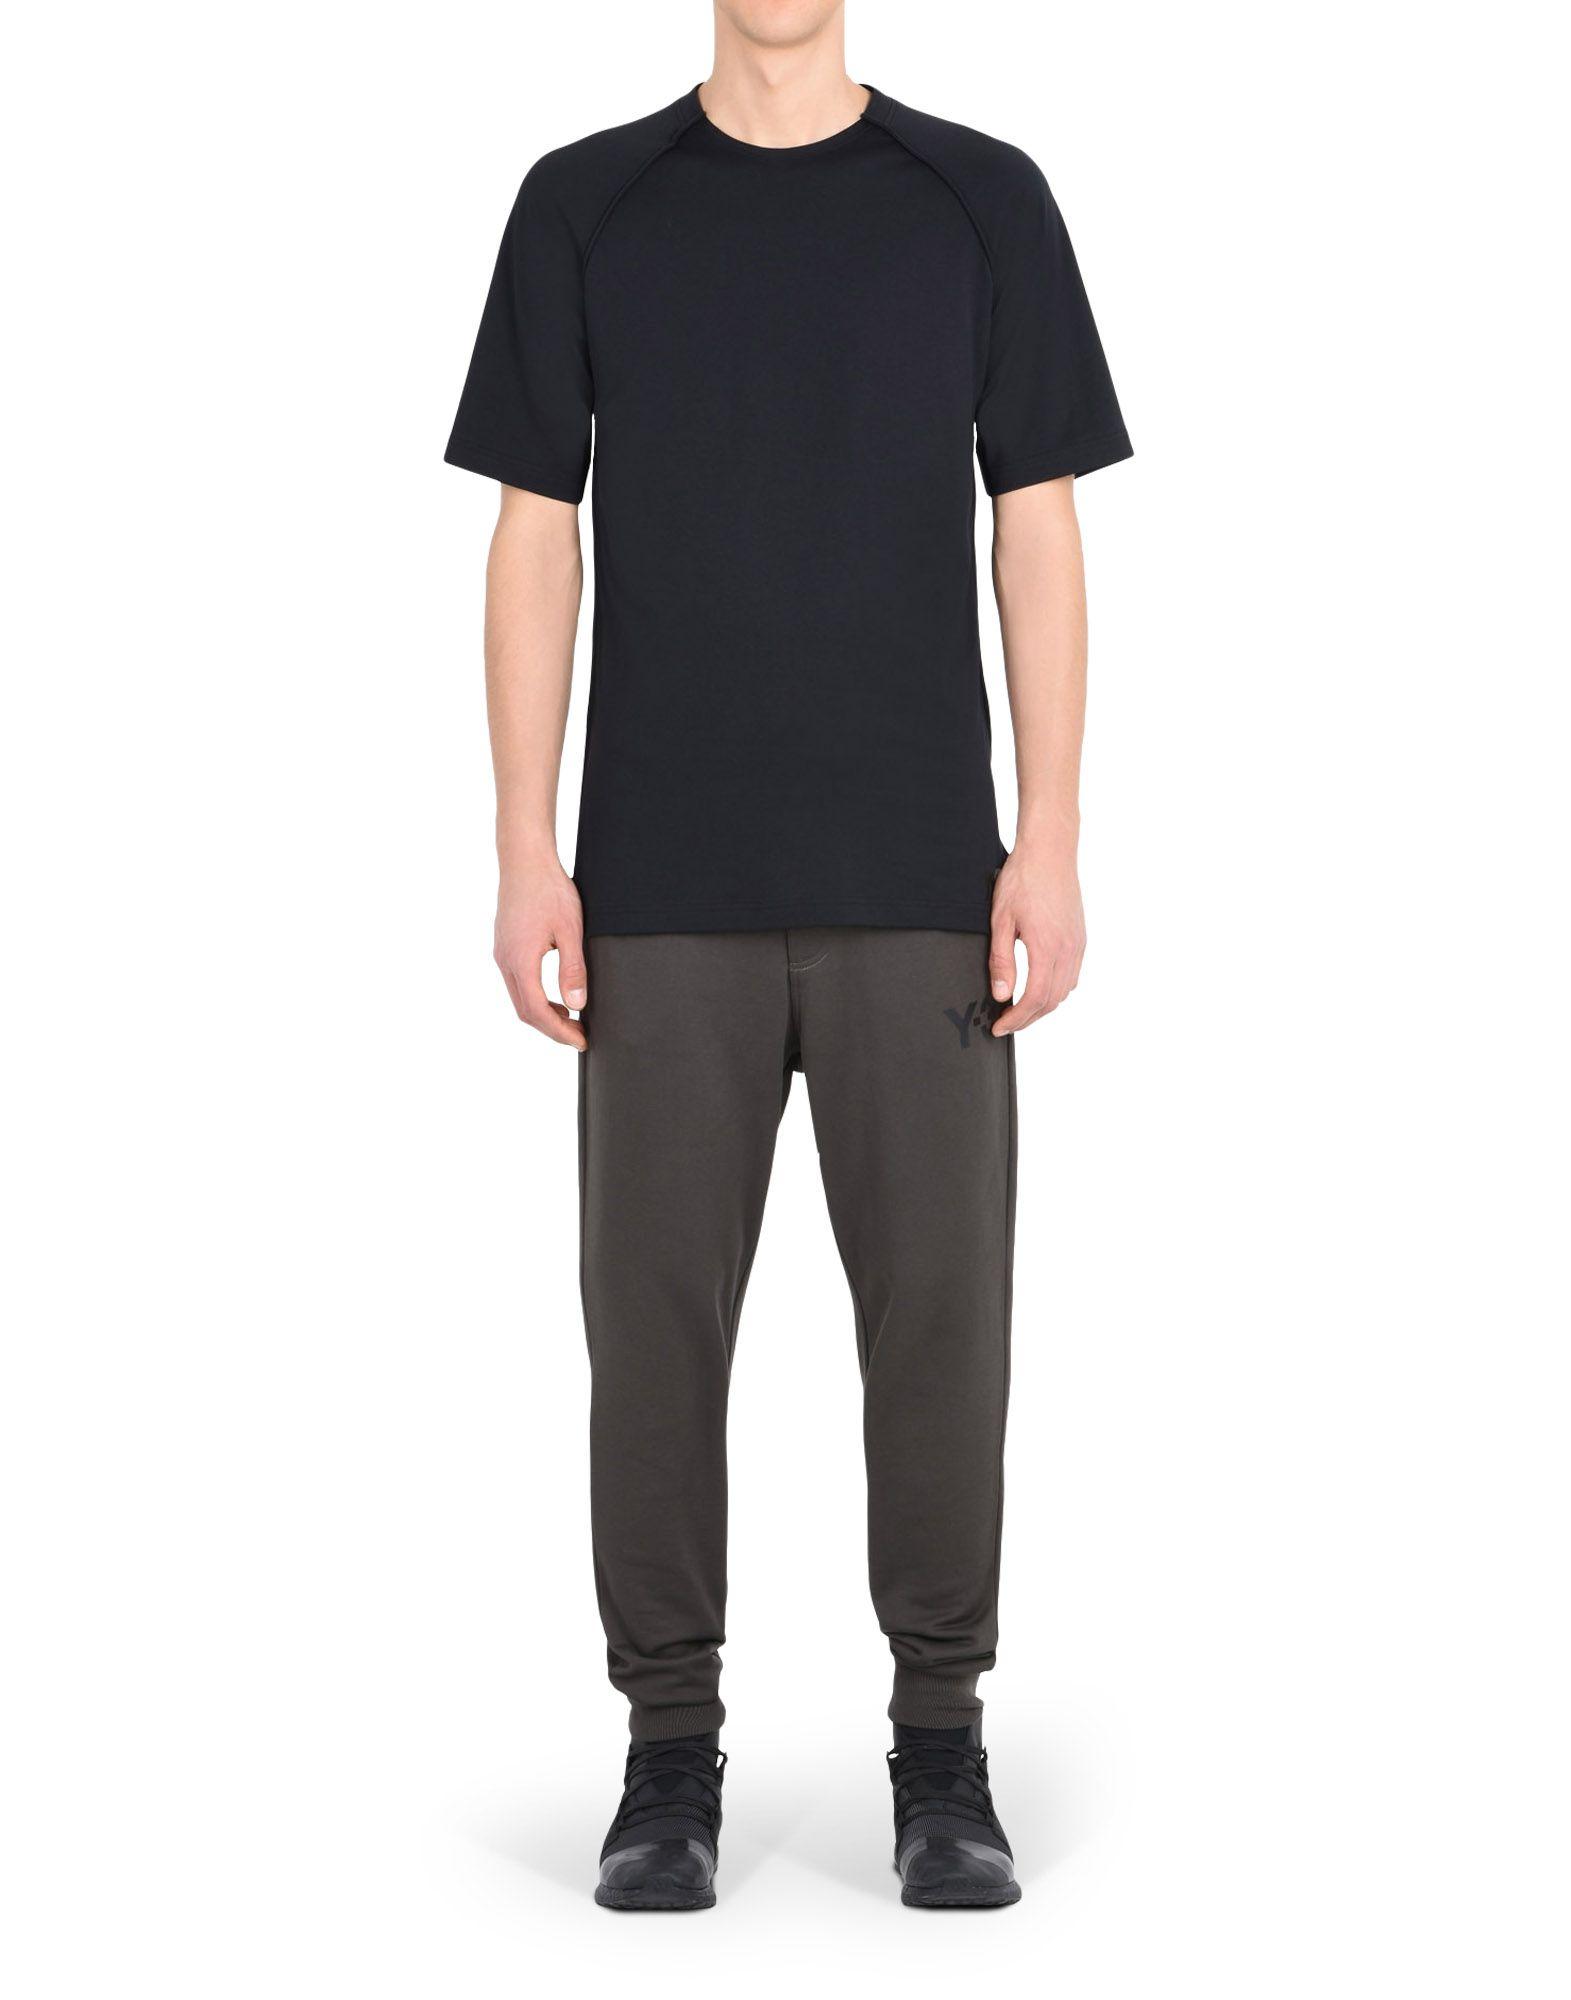 Y-3 Y-3 CLASSIC CUFFED PANT Sweatpants Man d